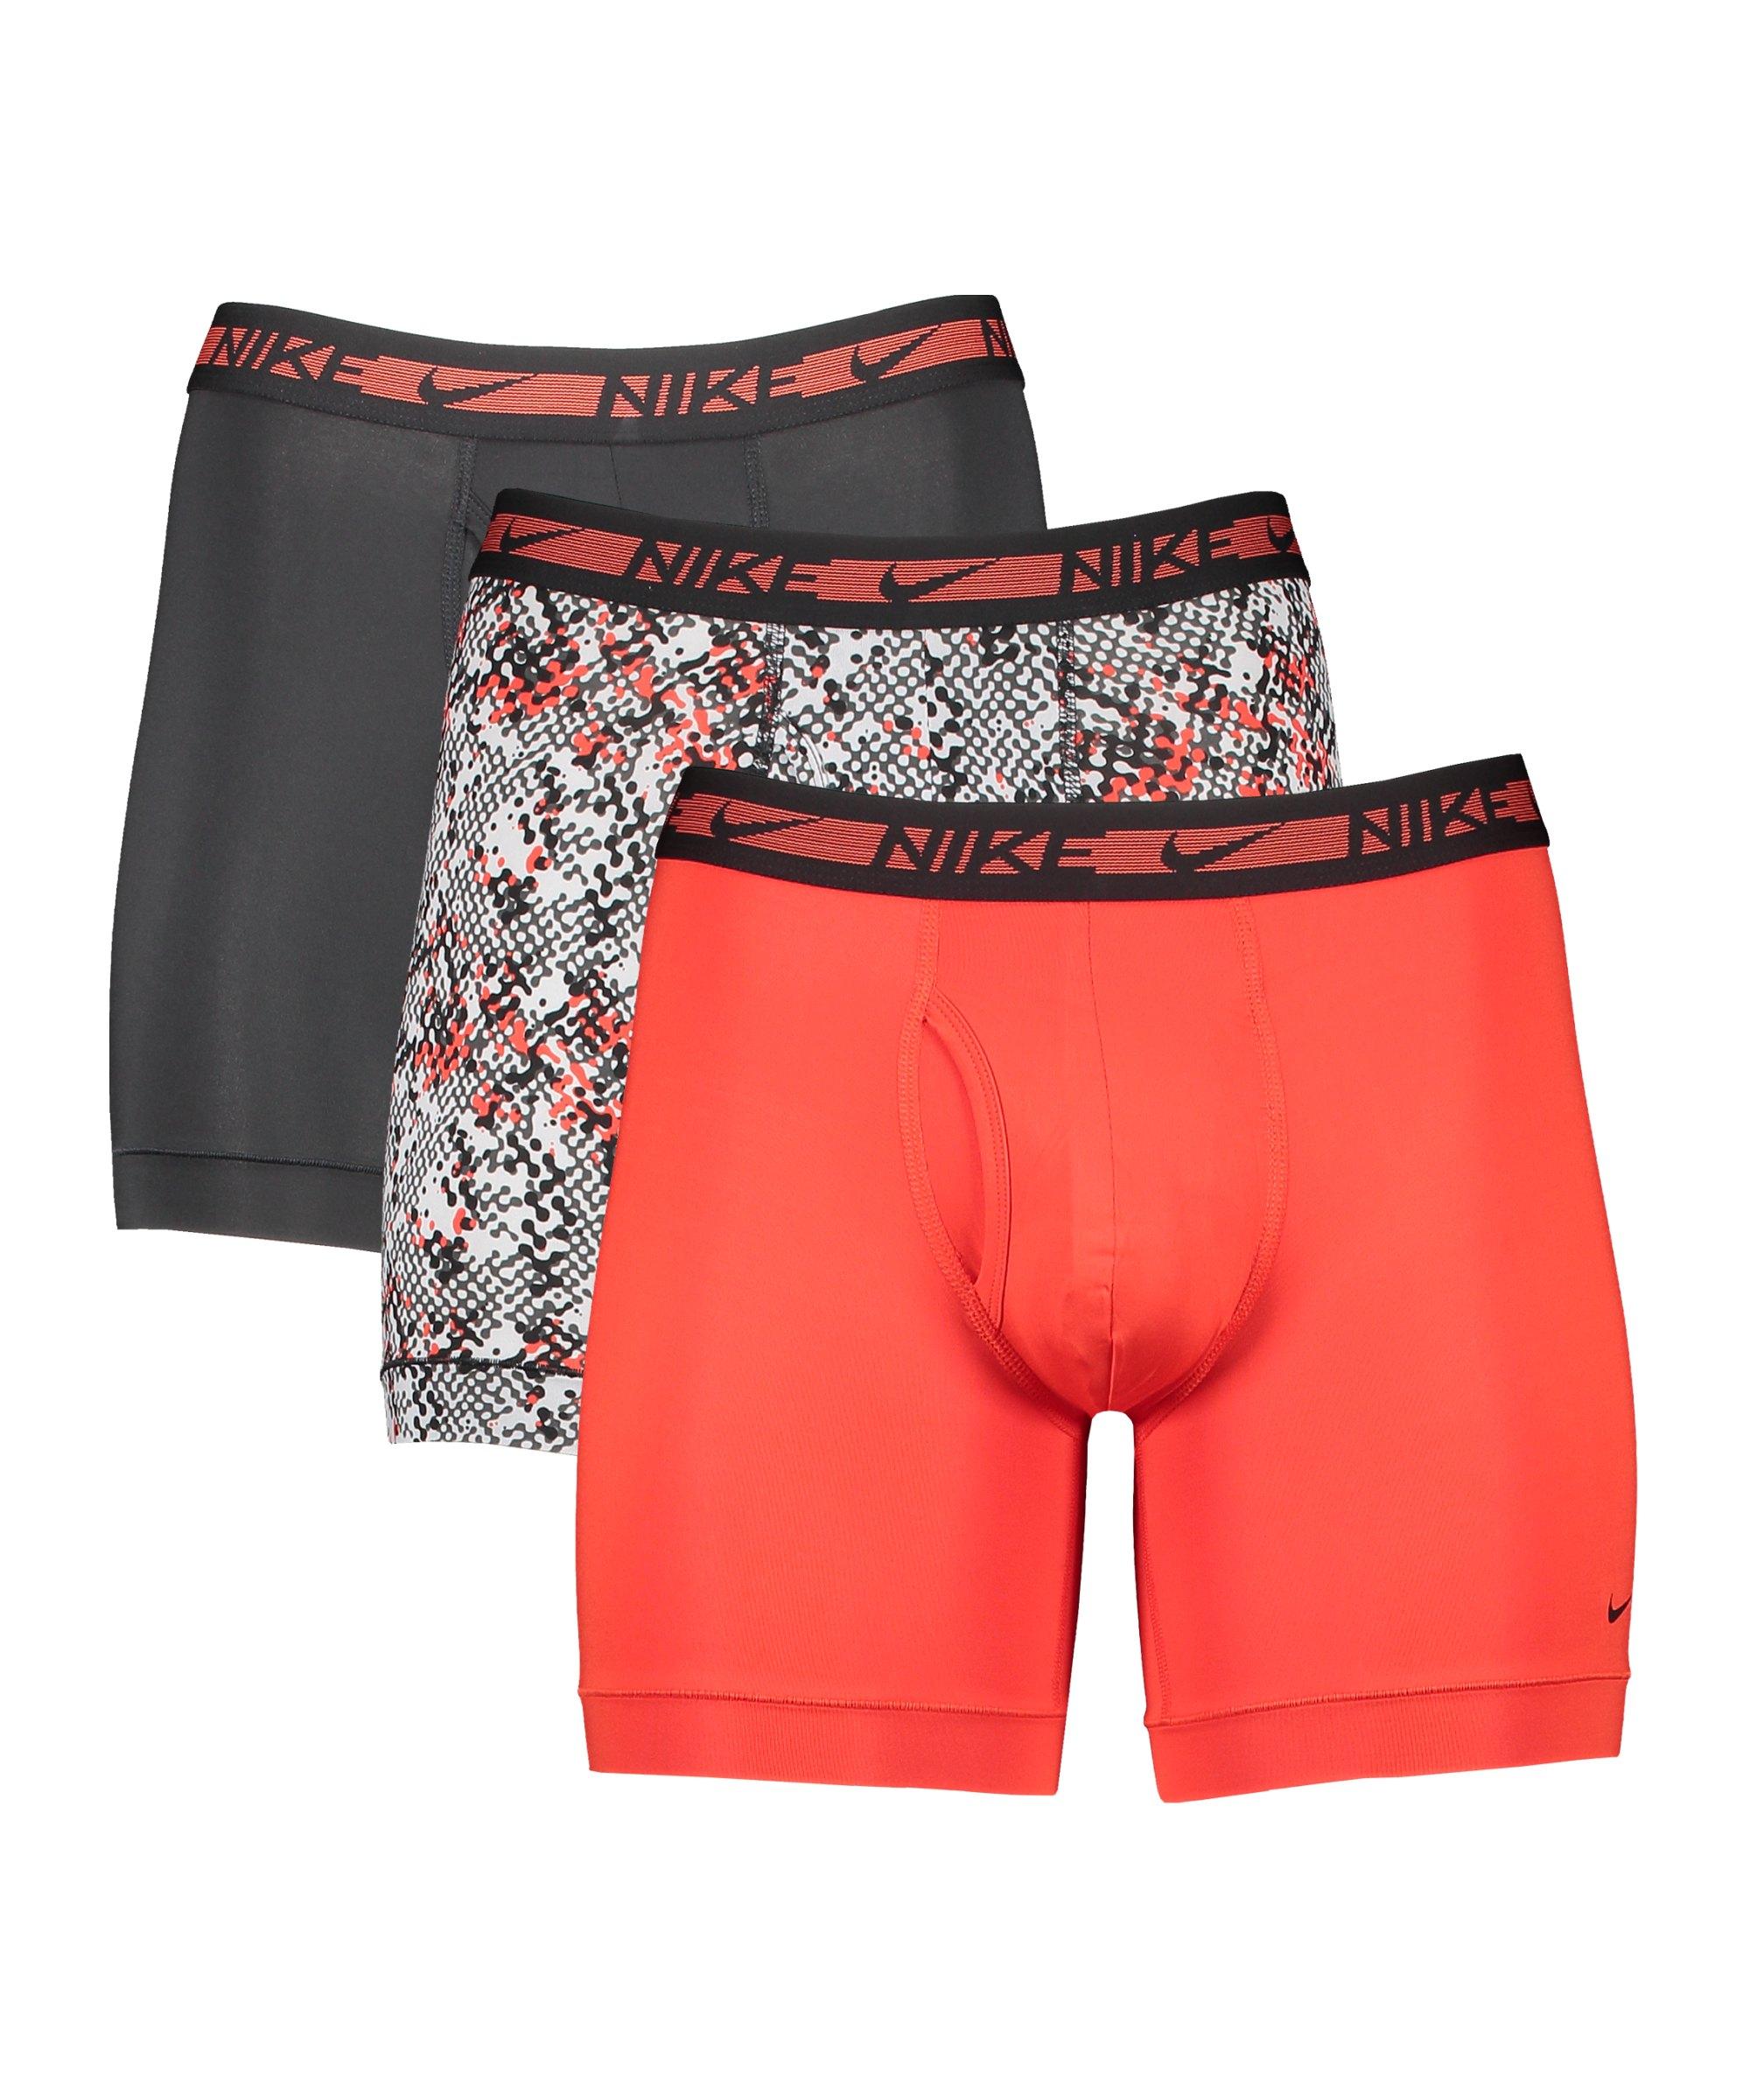 Nike Boxer Brief 3er Pack Boxershort FKUZ - schwarz